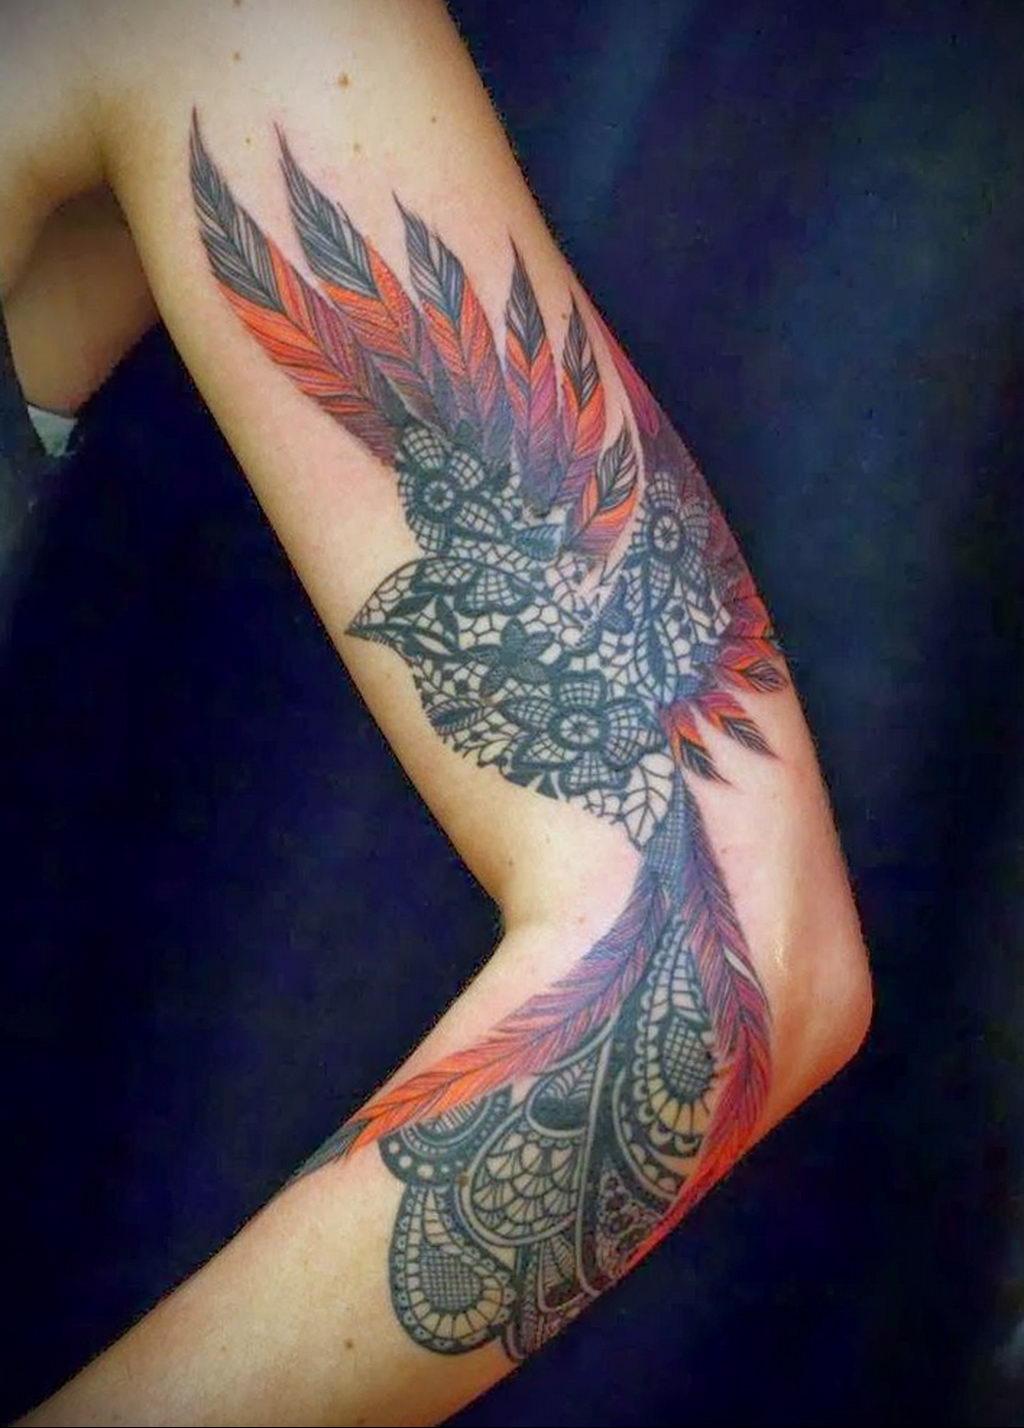 Фото тату про любовь рисунок Птица 03.02.2020 №091 -bird tattoo- tatufoto.com